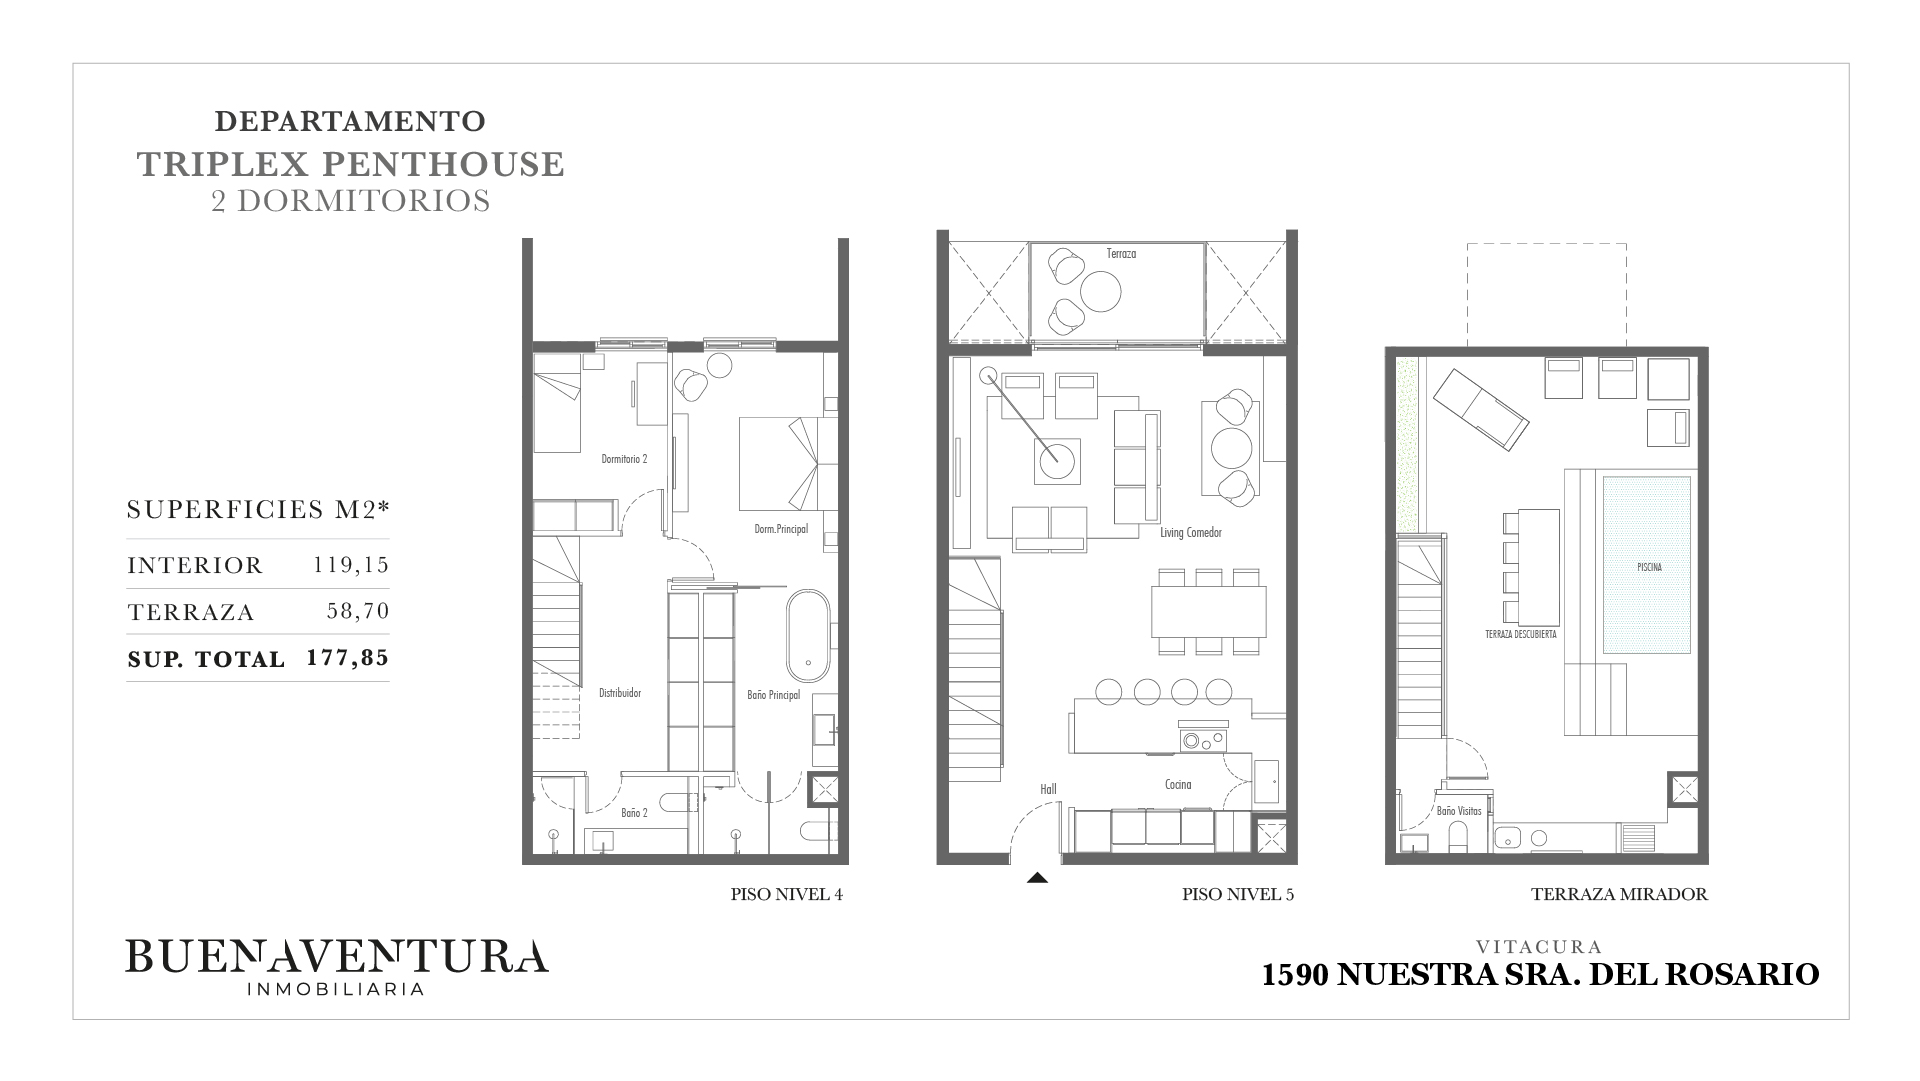 Triplex penthouse